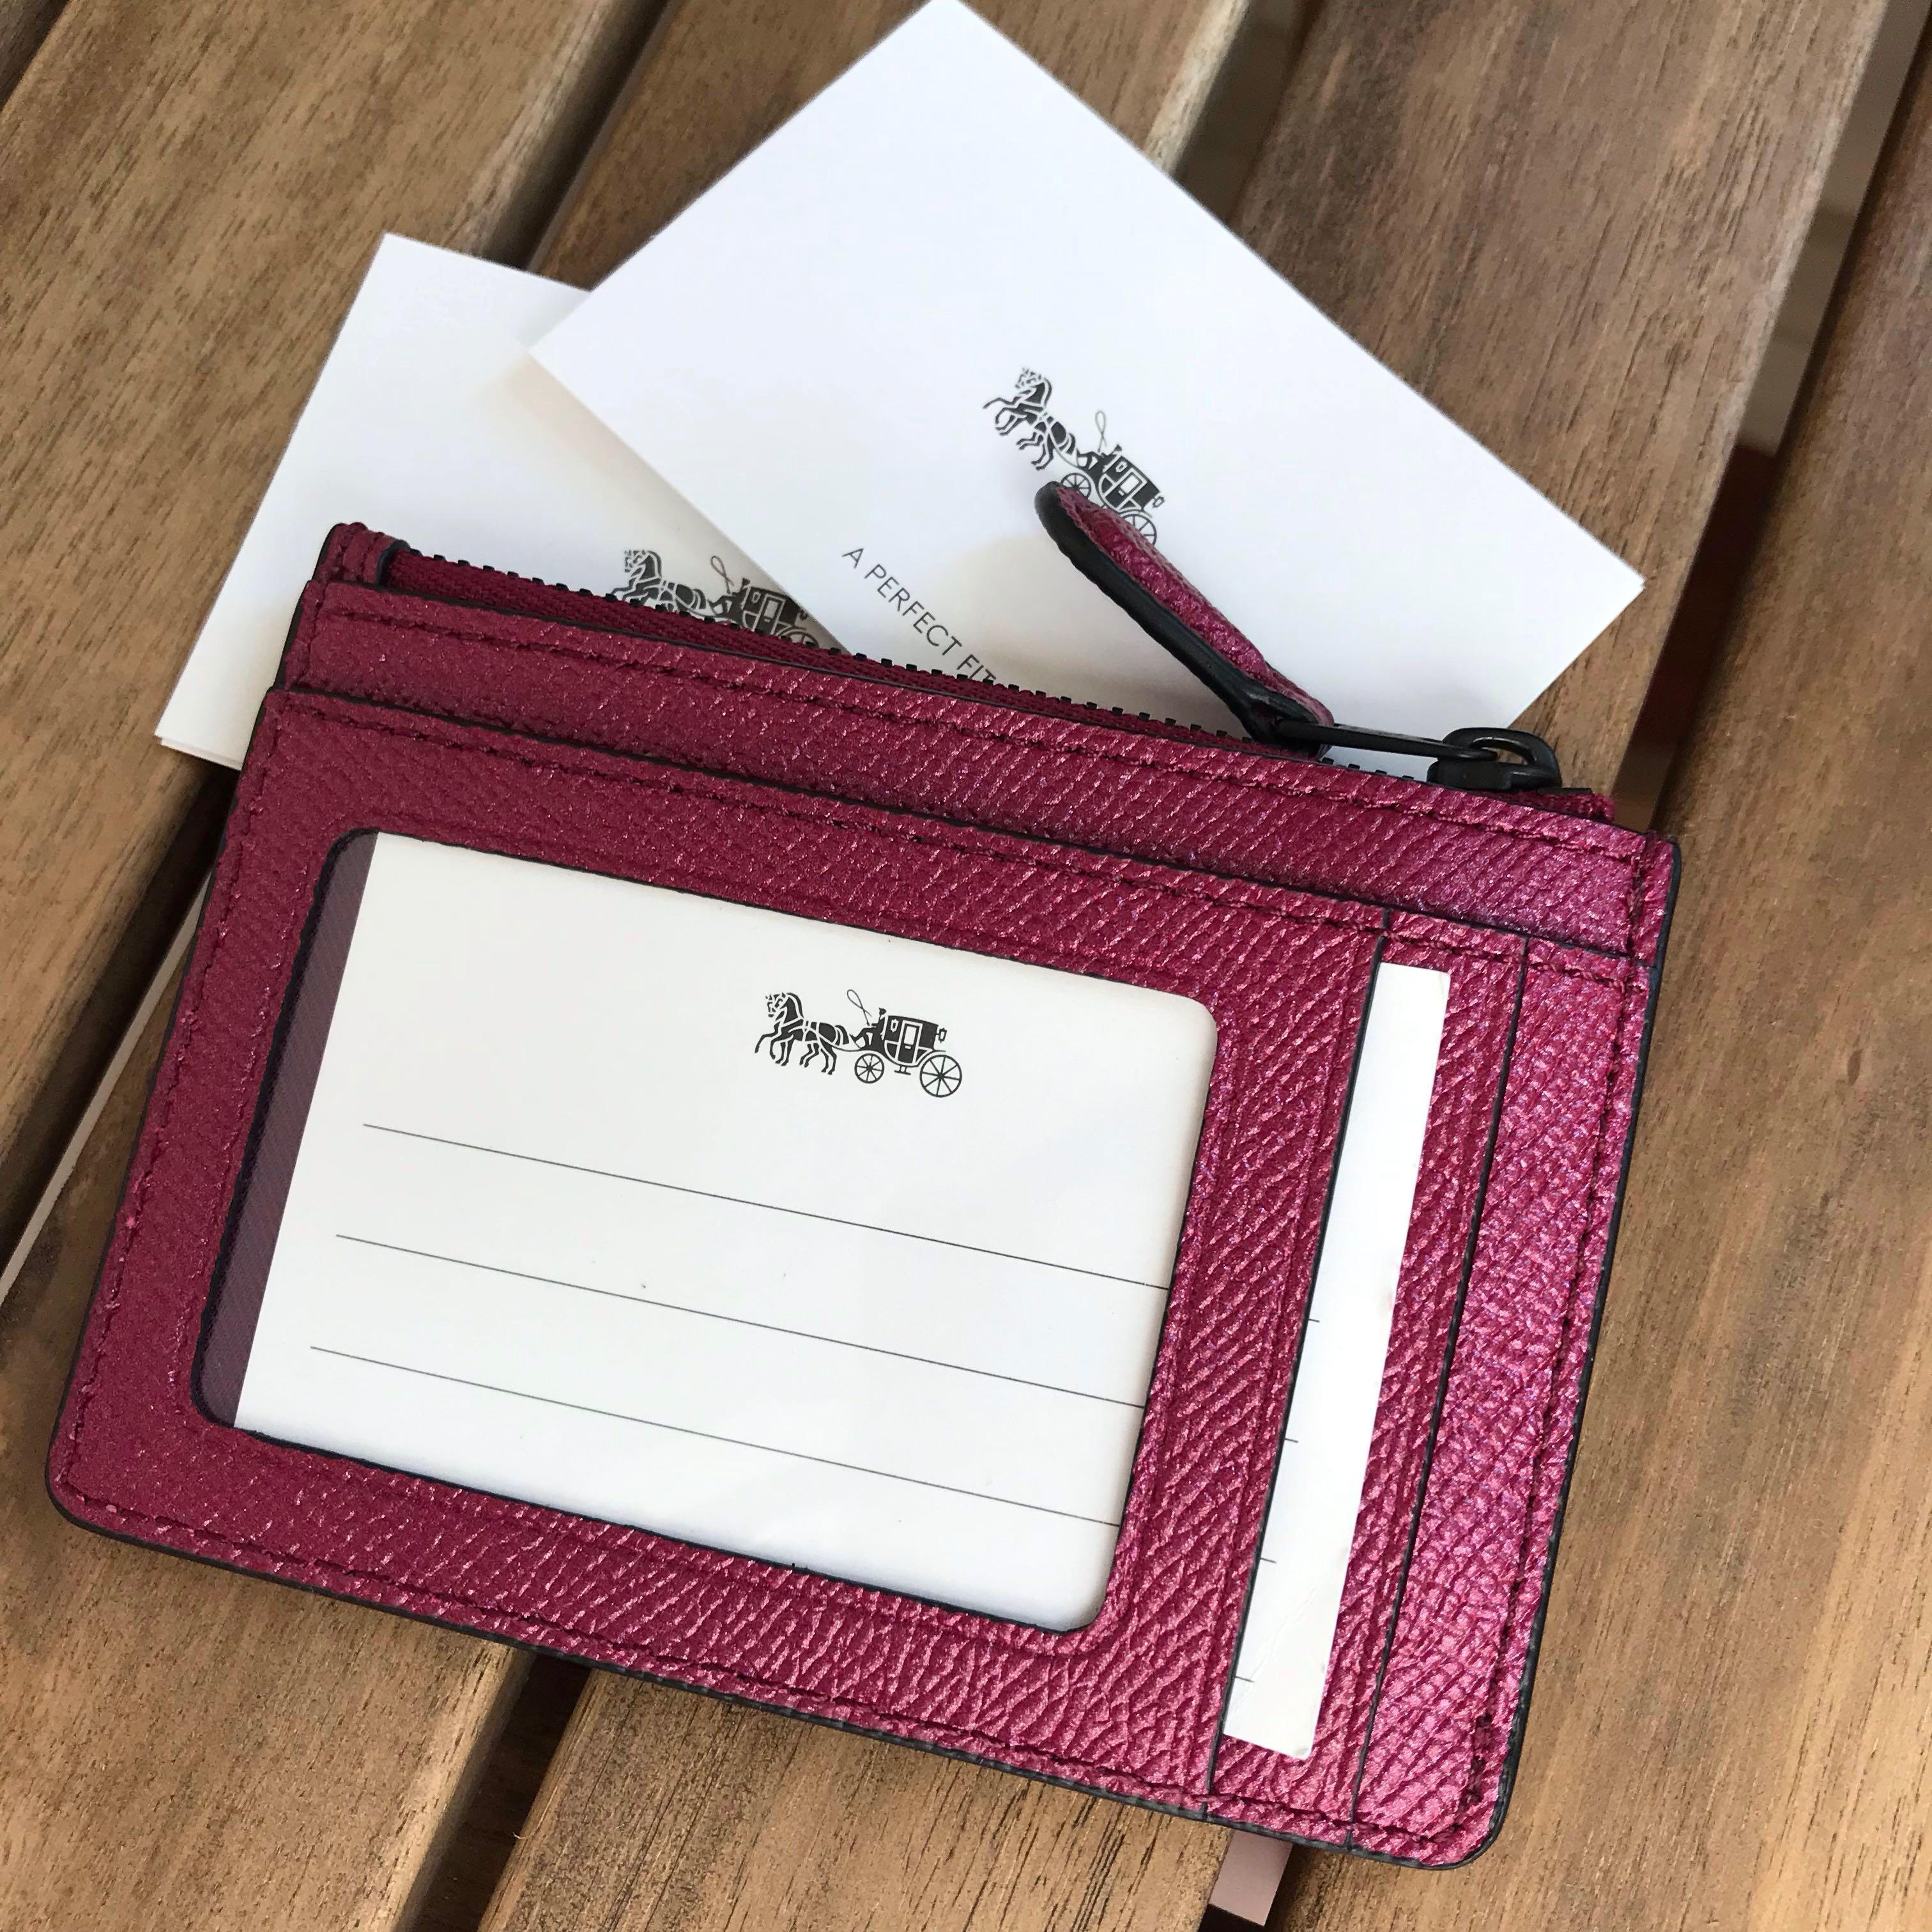 Brand NEW! COACH Skinny ID/coin case in rare iridescent colour